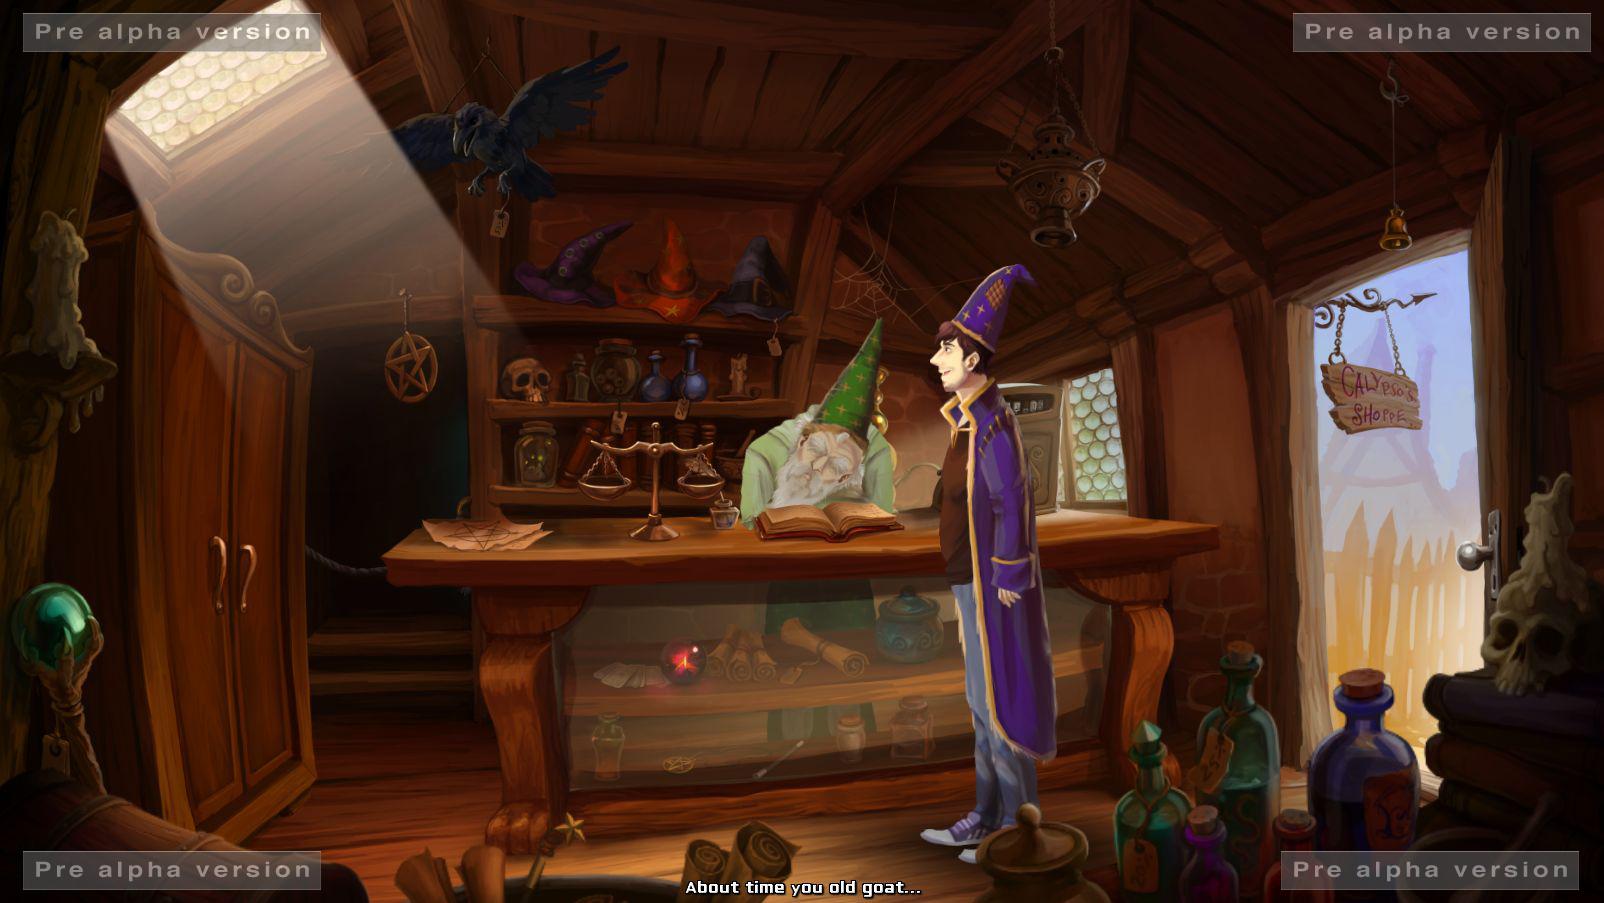 Simon the Sorcerer visita a su viejo amigo Calypso.